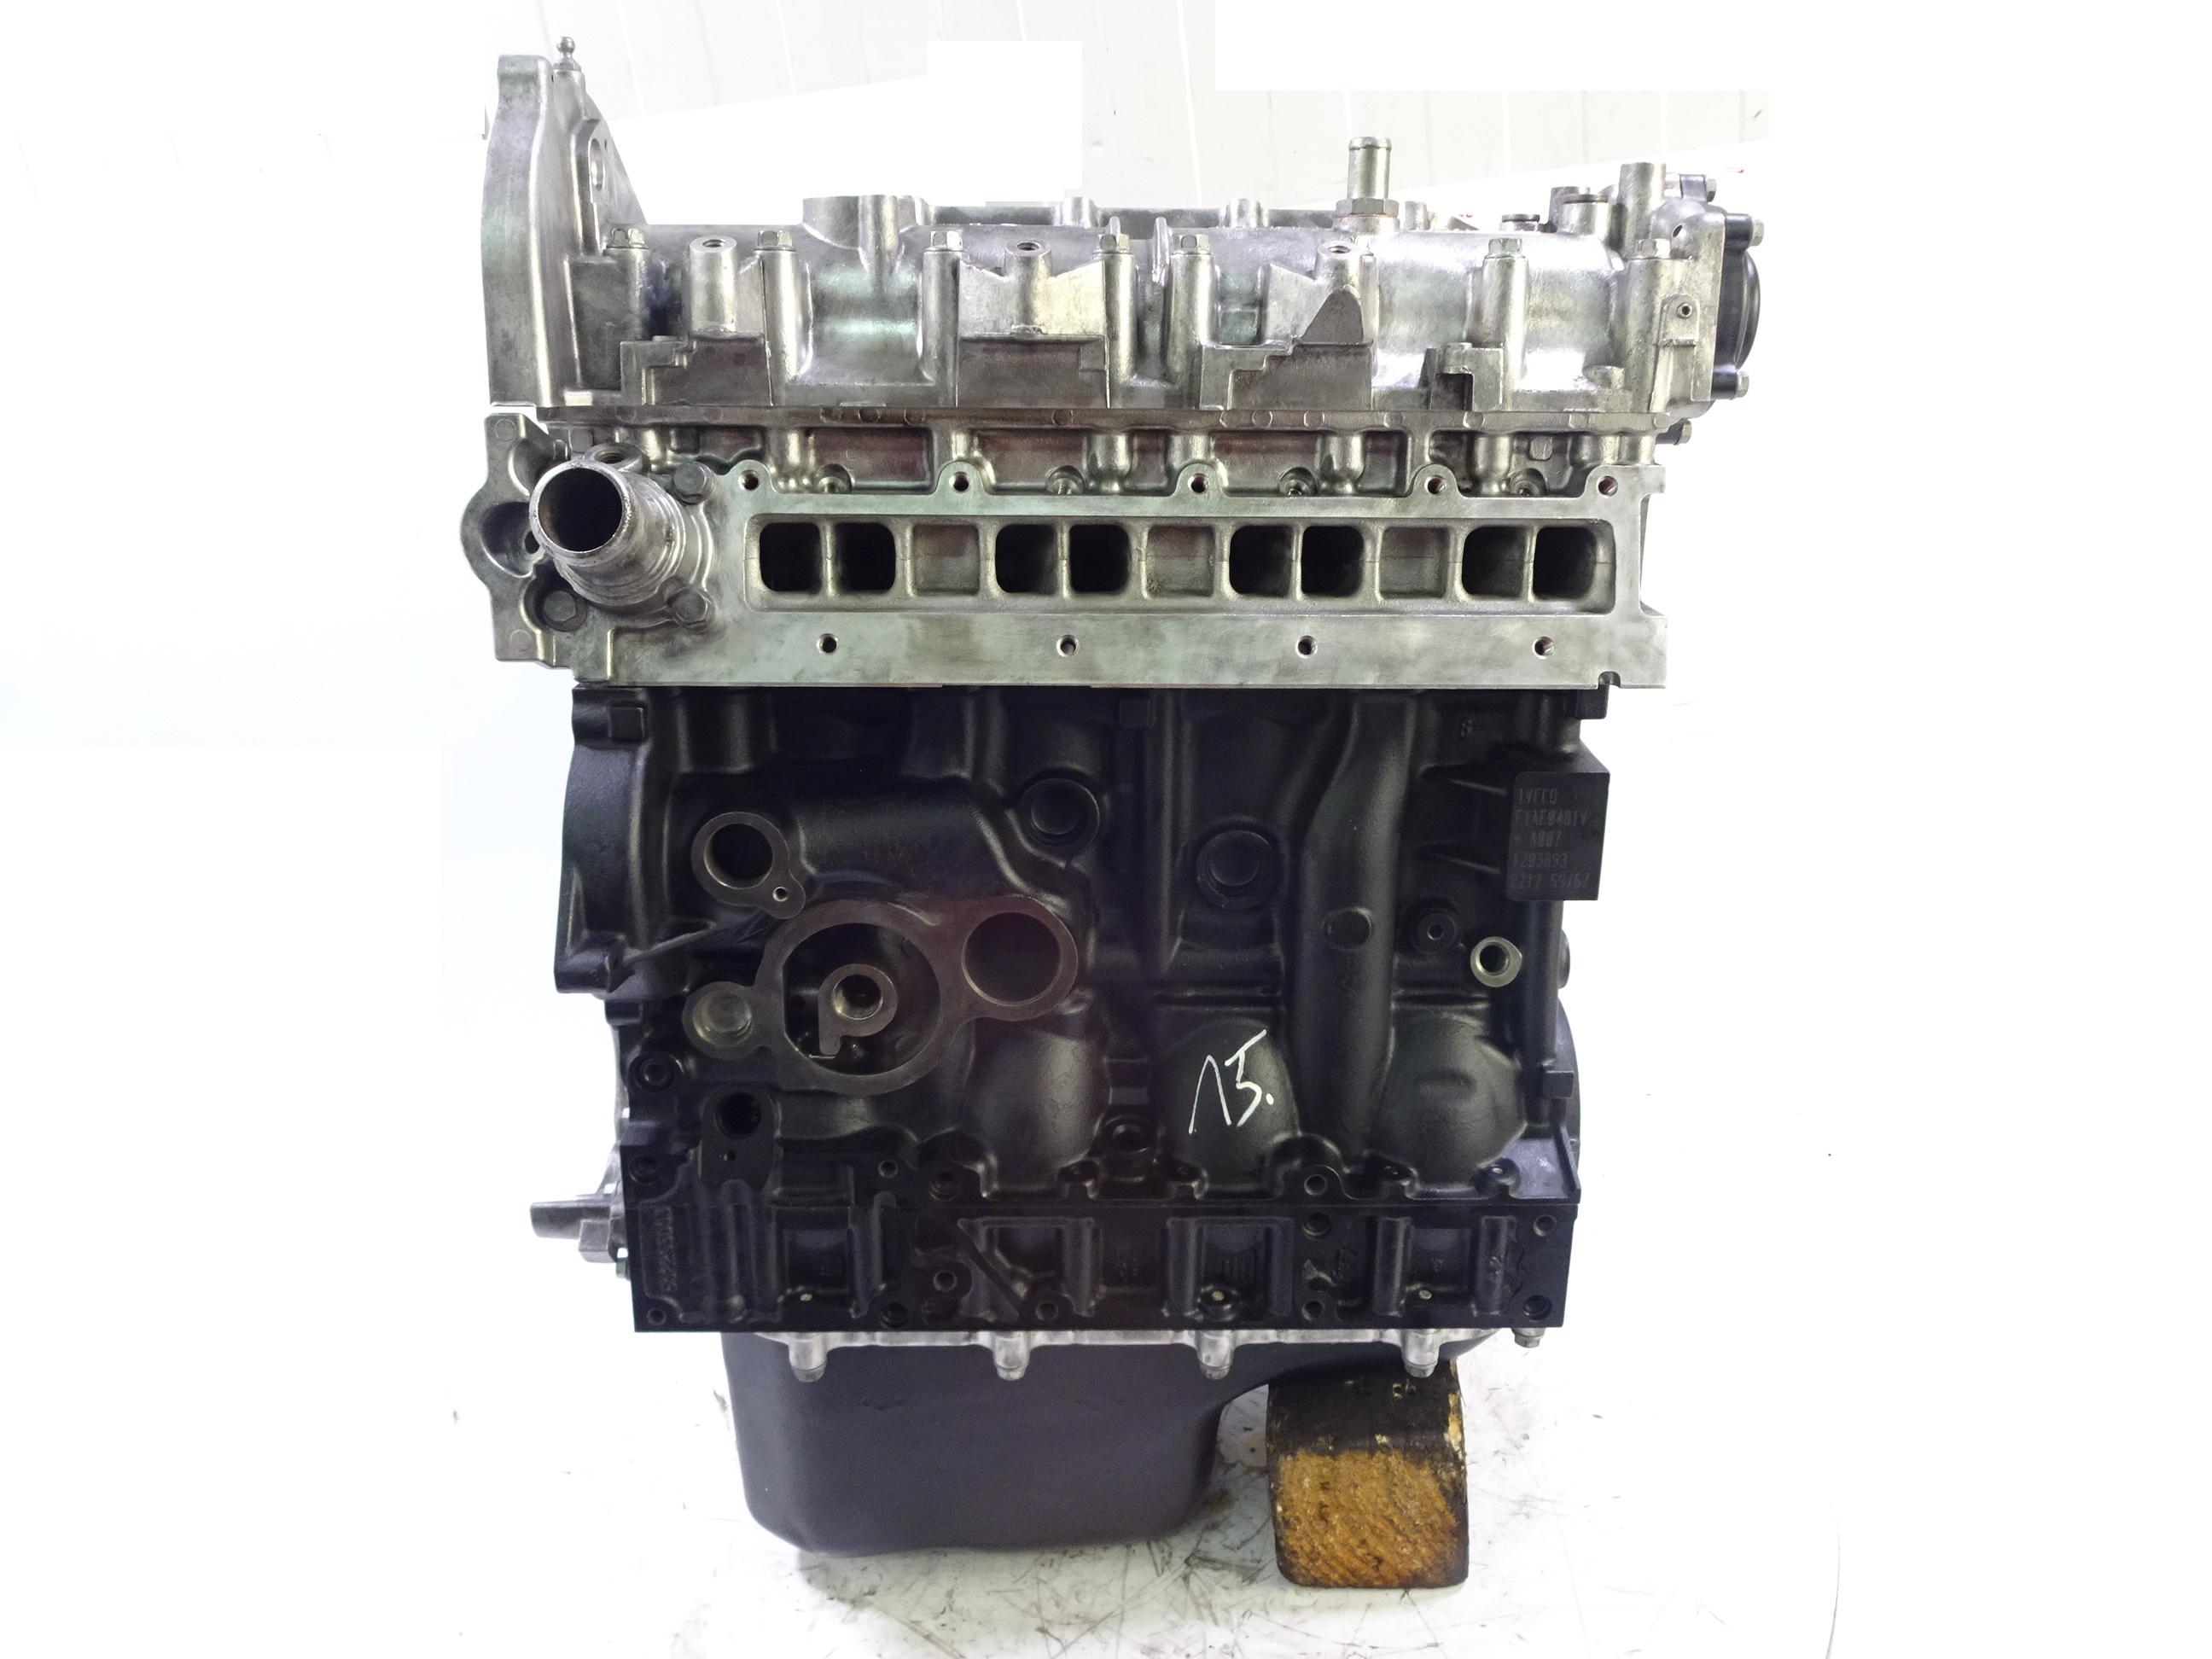 Motor 2010 für Iveco Daily 2,3 D F1AE0481V F1AE Kolben Kettensatz Dichtung NEU